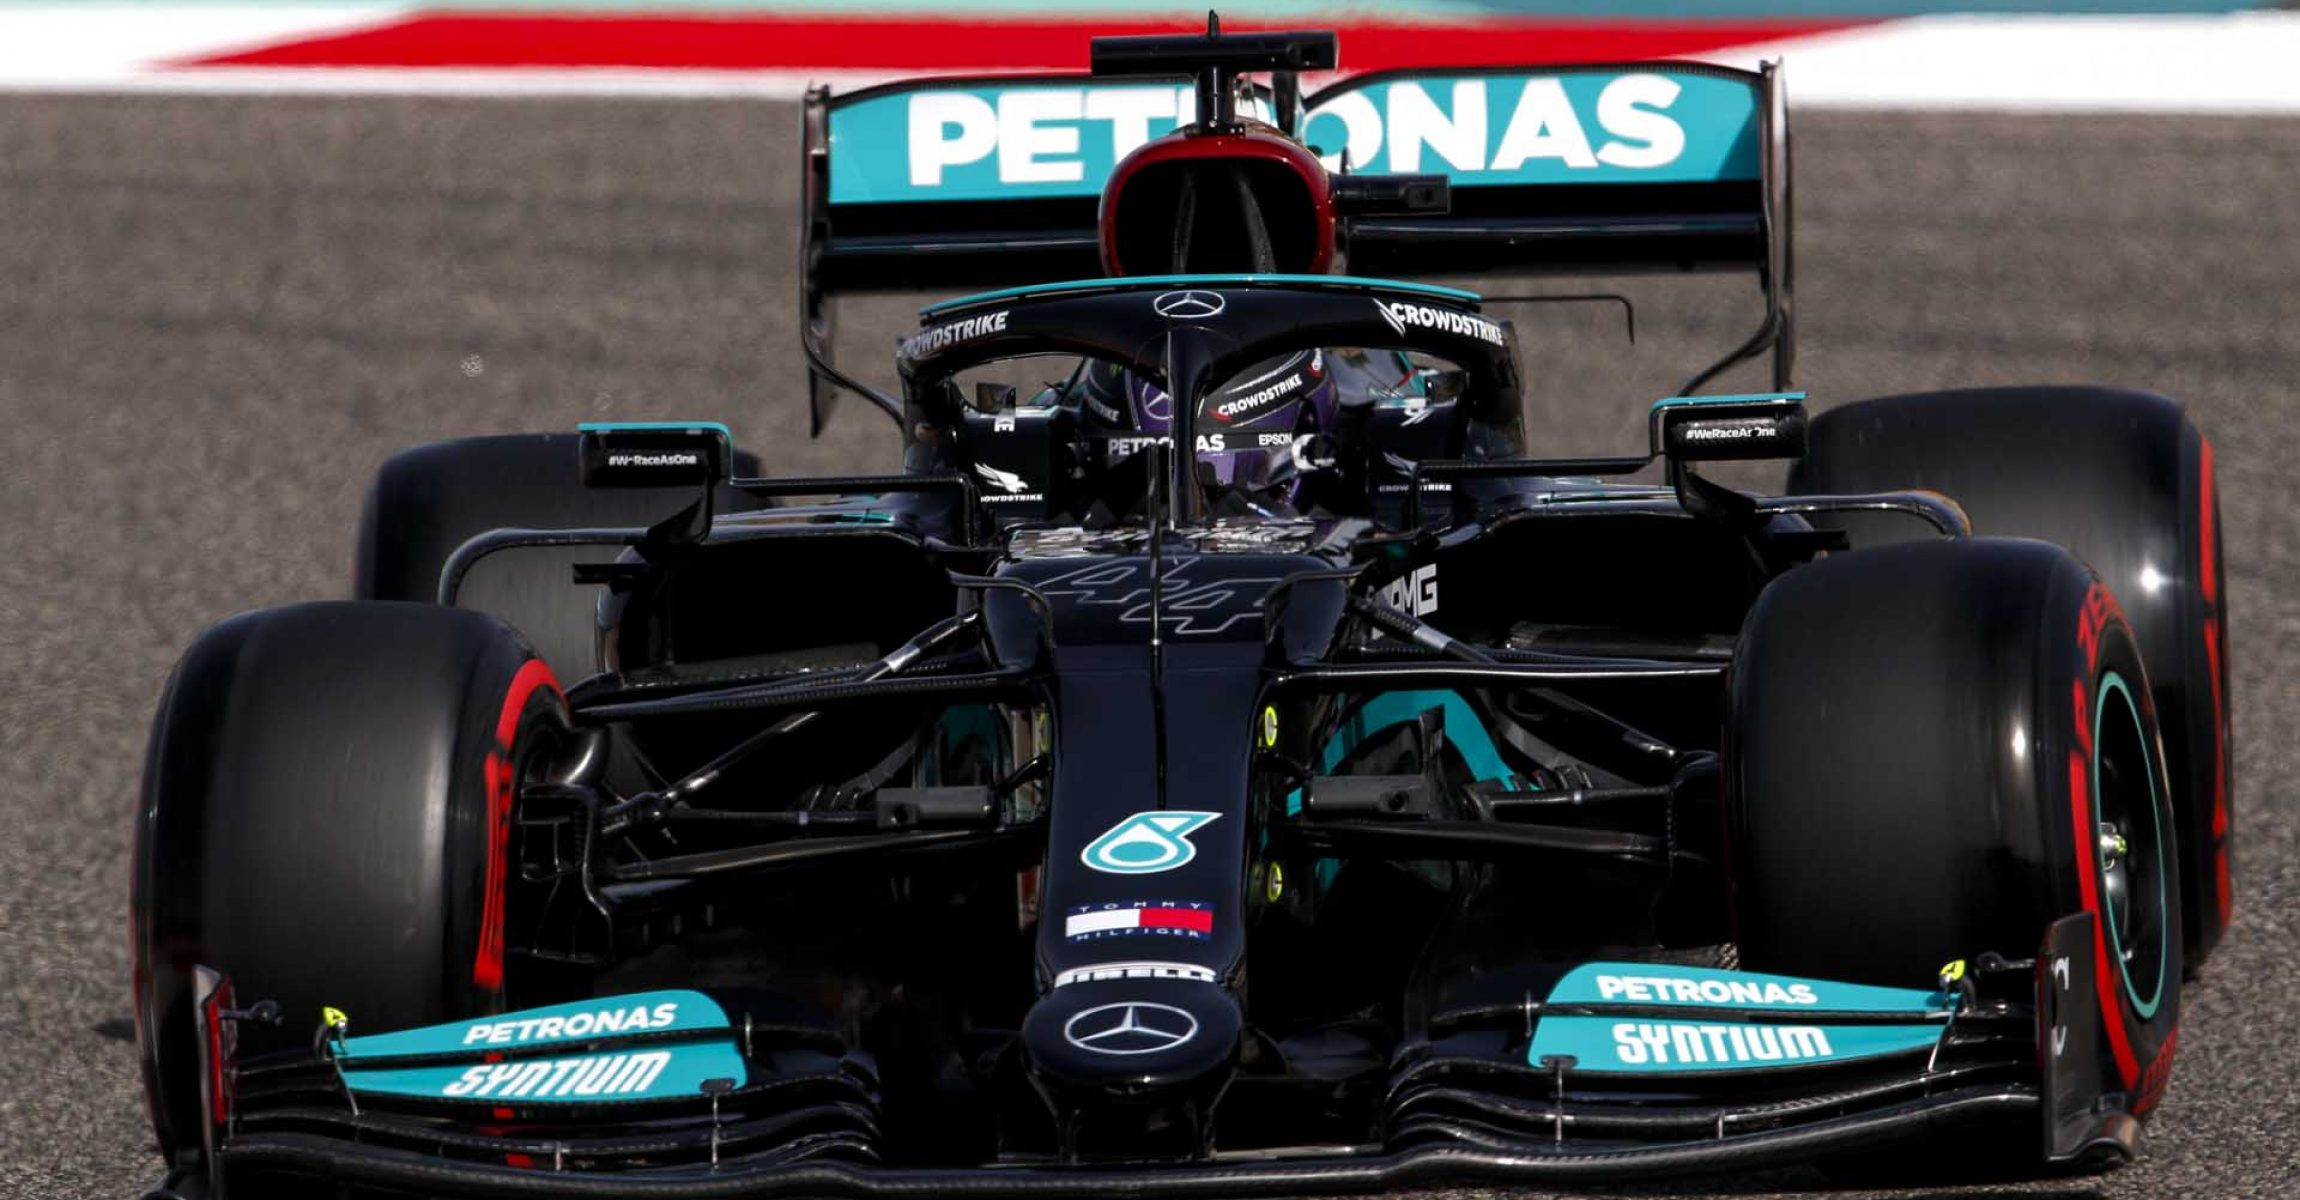 2021 Bahrain Grand Prix, Friday - LAT Images Lewis Hamilton Mercedes